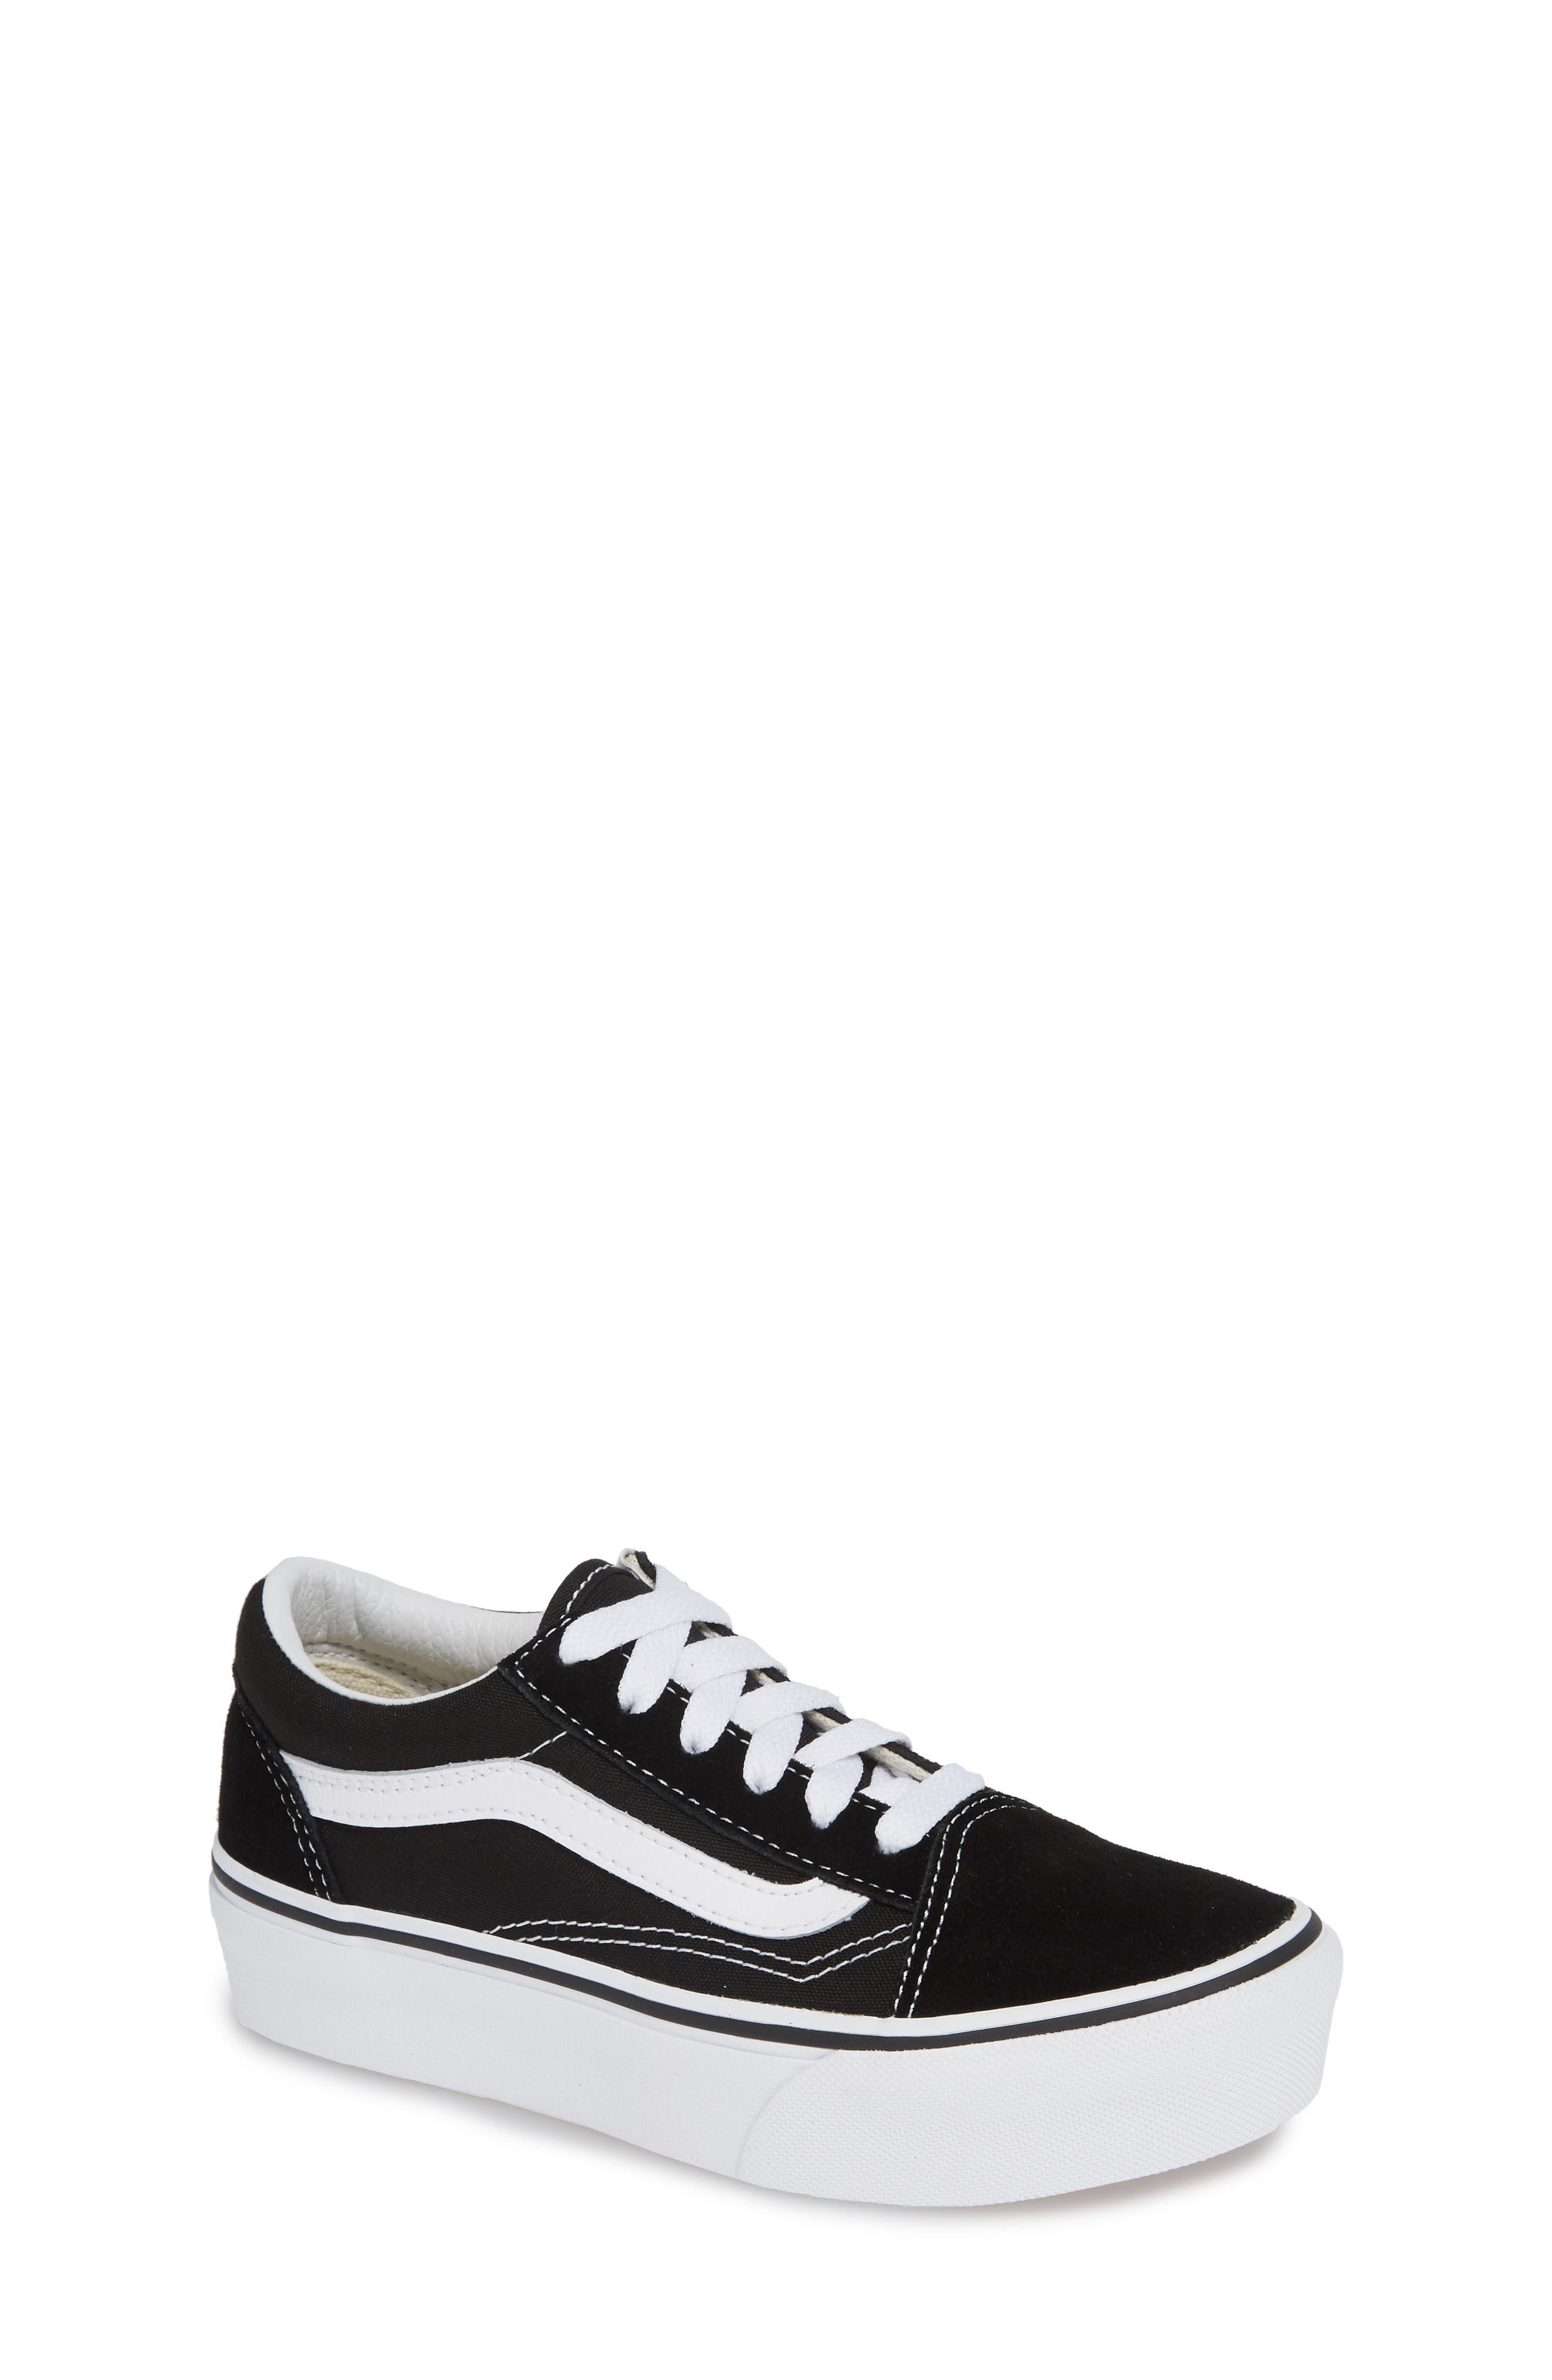 VANS, Old Skool Platform Sneaker, Main thumbnail 1, color, BLACK/ TRUE WHITE